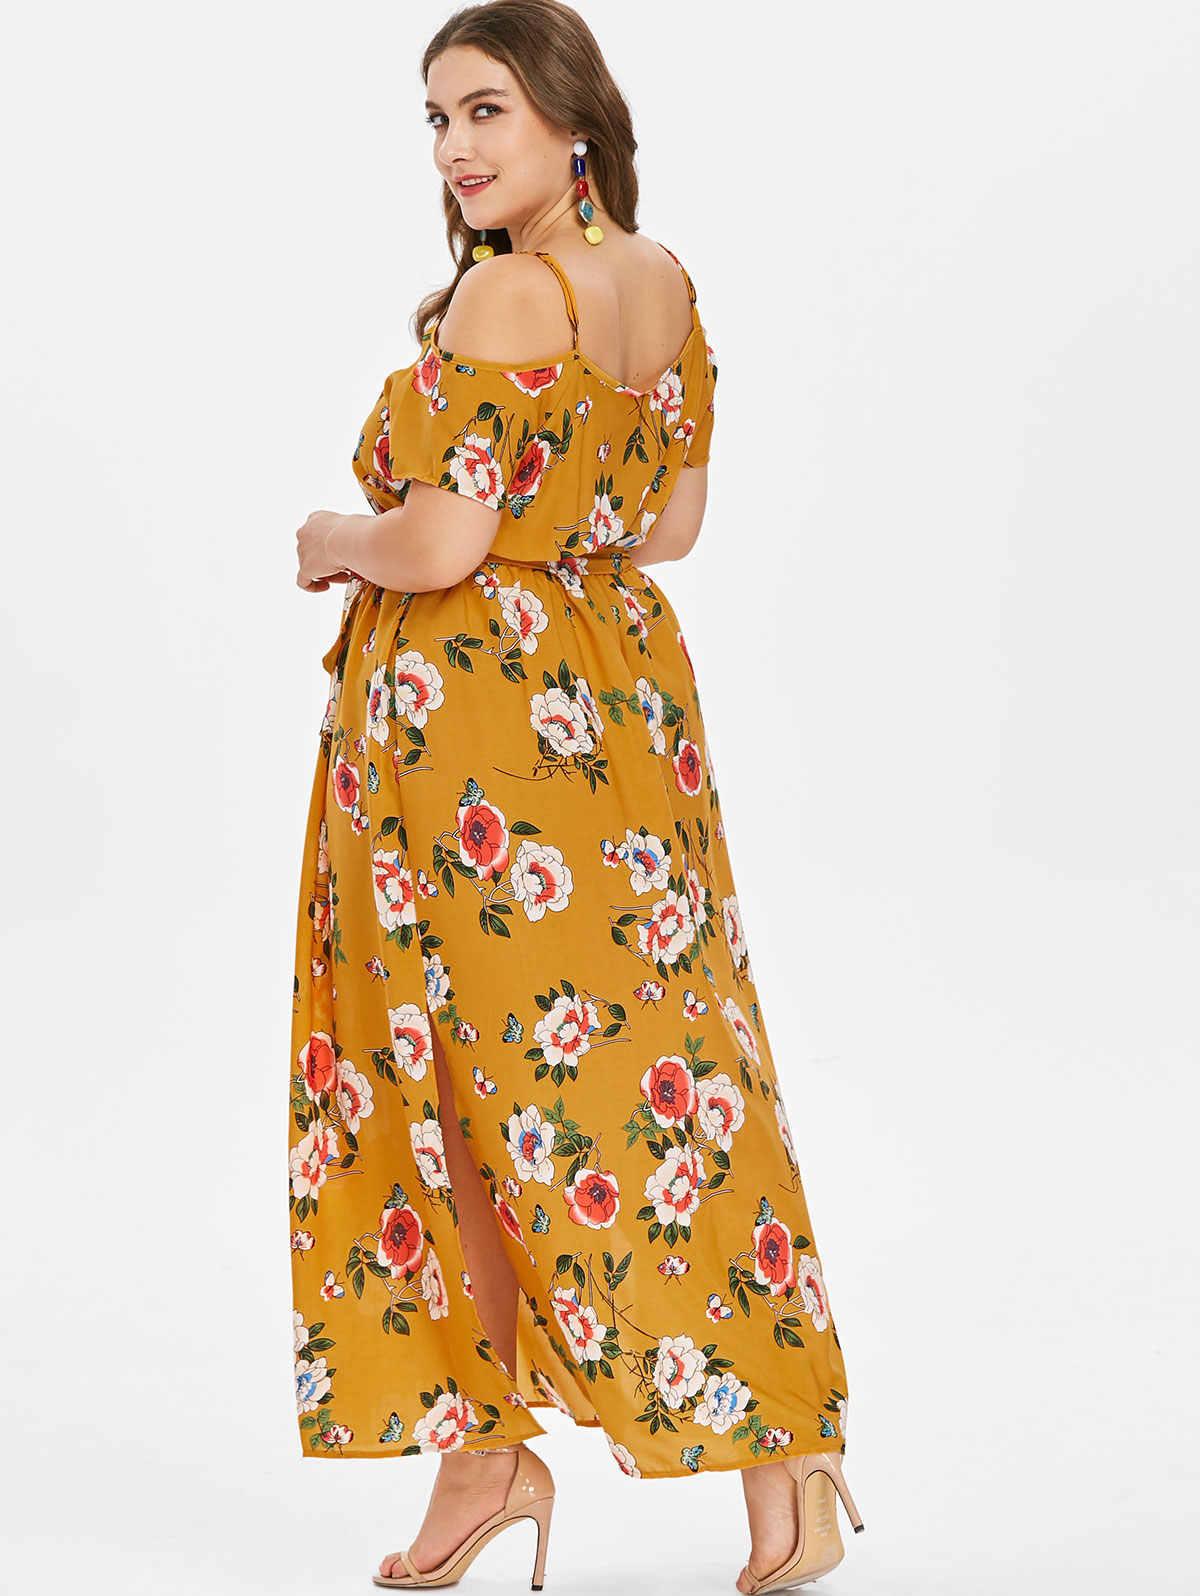 ... Wipalo Plus Size Boho Cami Empire Waist Dress Floral Print Slit Belt Cold  Shoulder Spaghetti Strap ... 3cbdfa156050